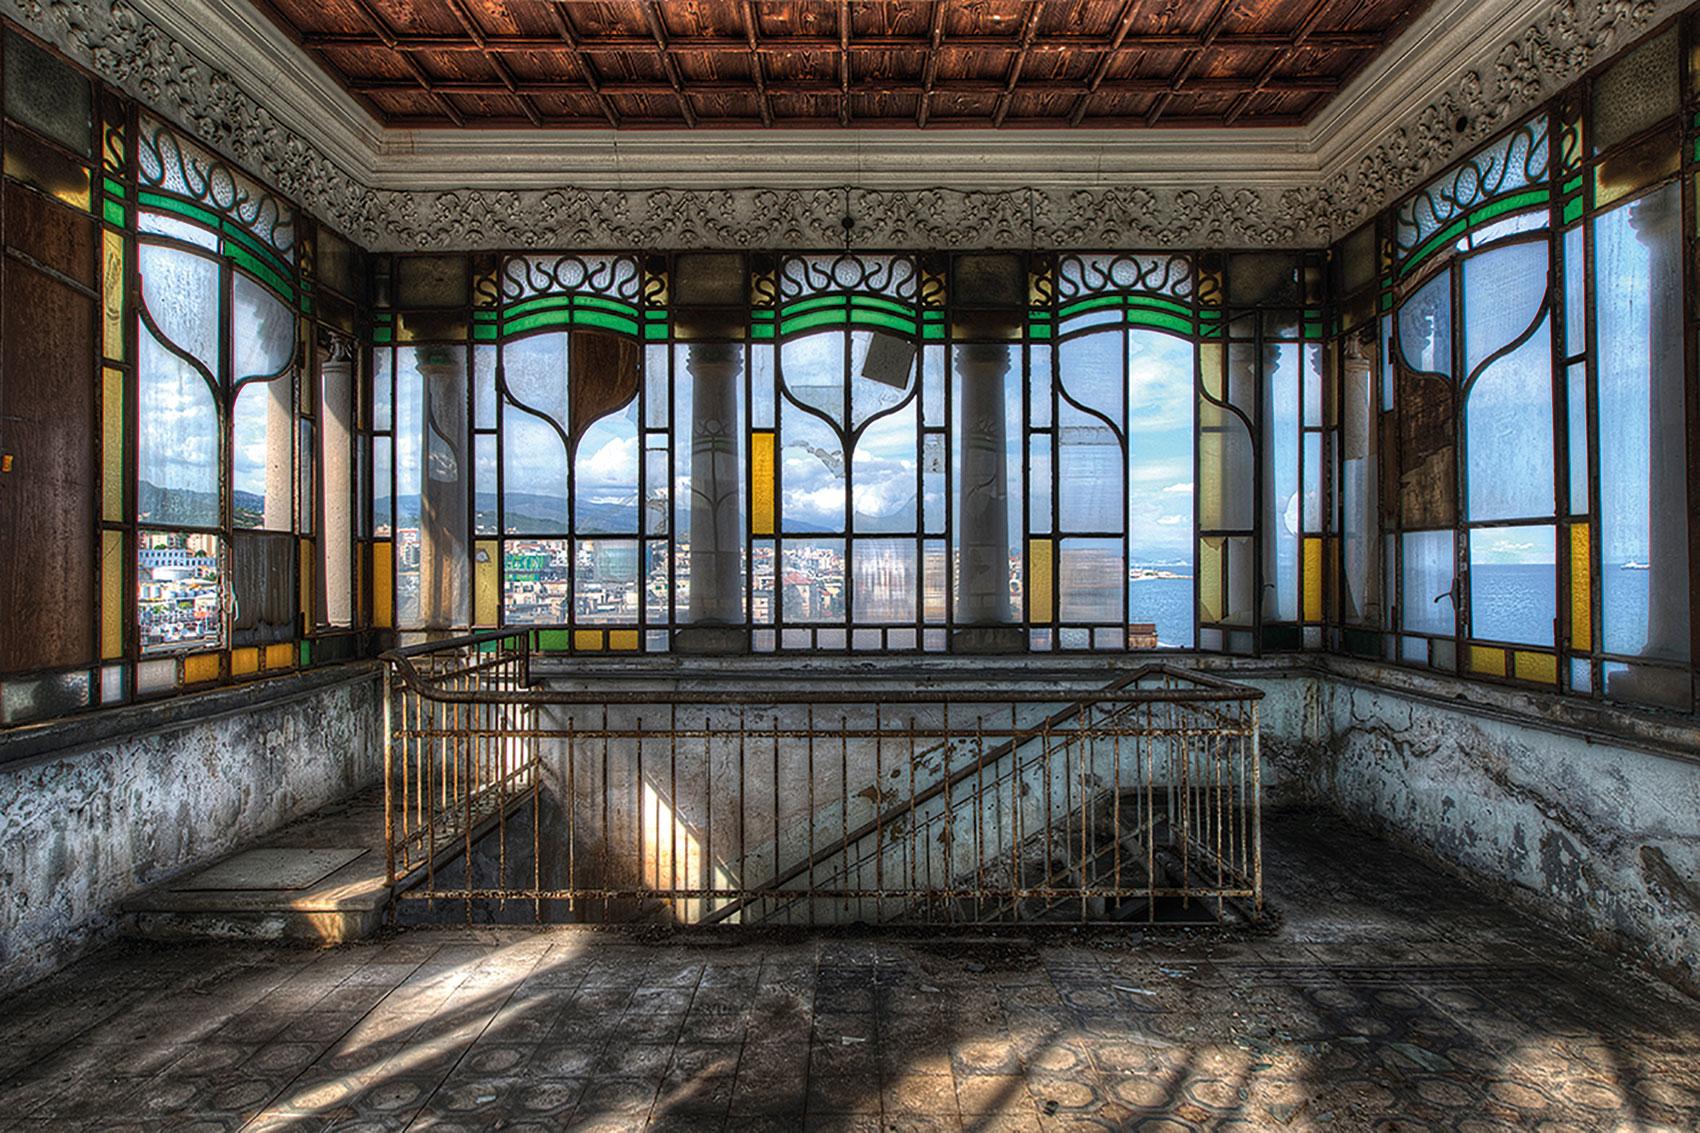 Olivier Lacour: Bild 'Glas in lood'